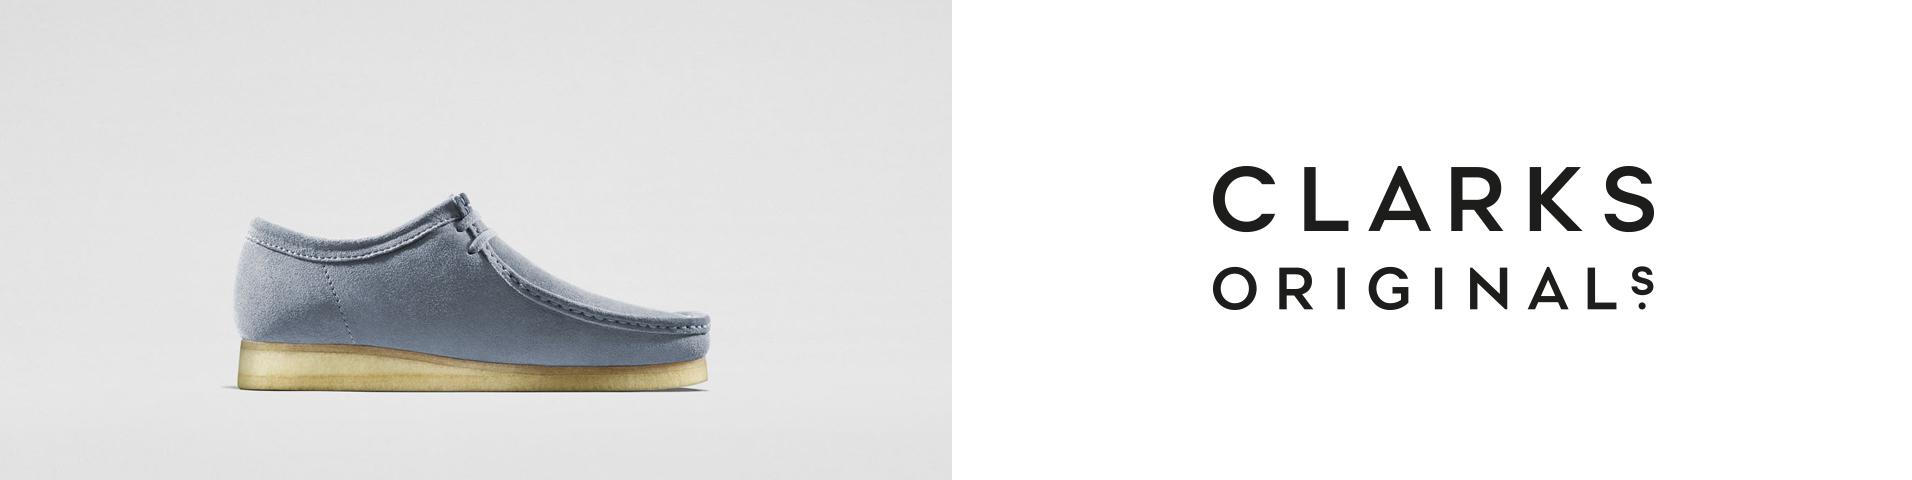 size 40 19582 56fe2 Scarpe da uomo Clarks Originals | Promo su Zalando